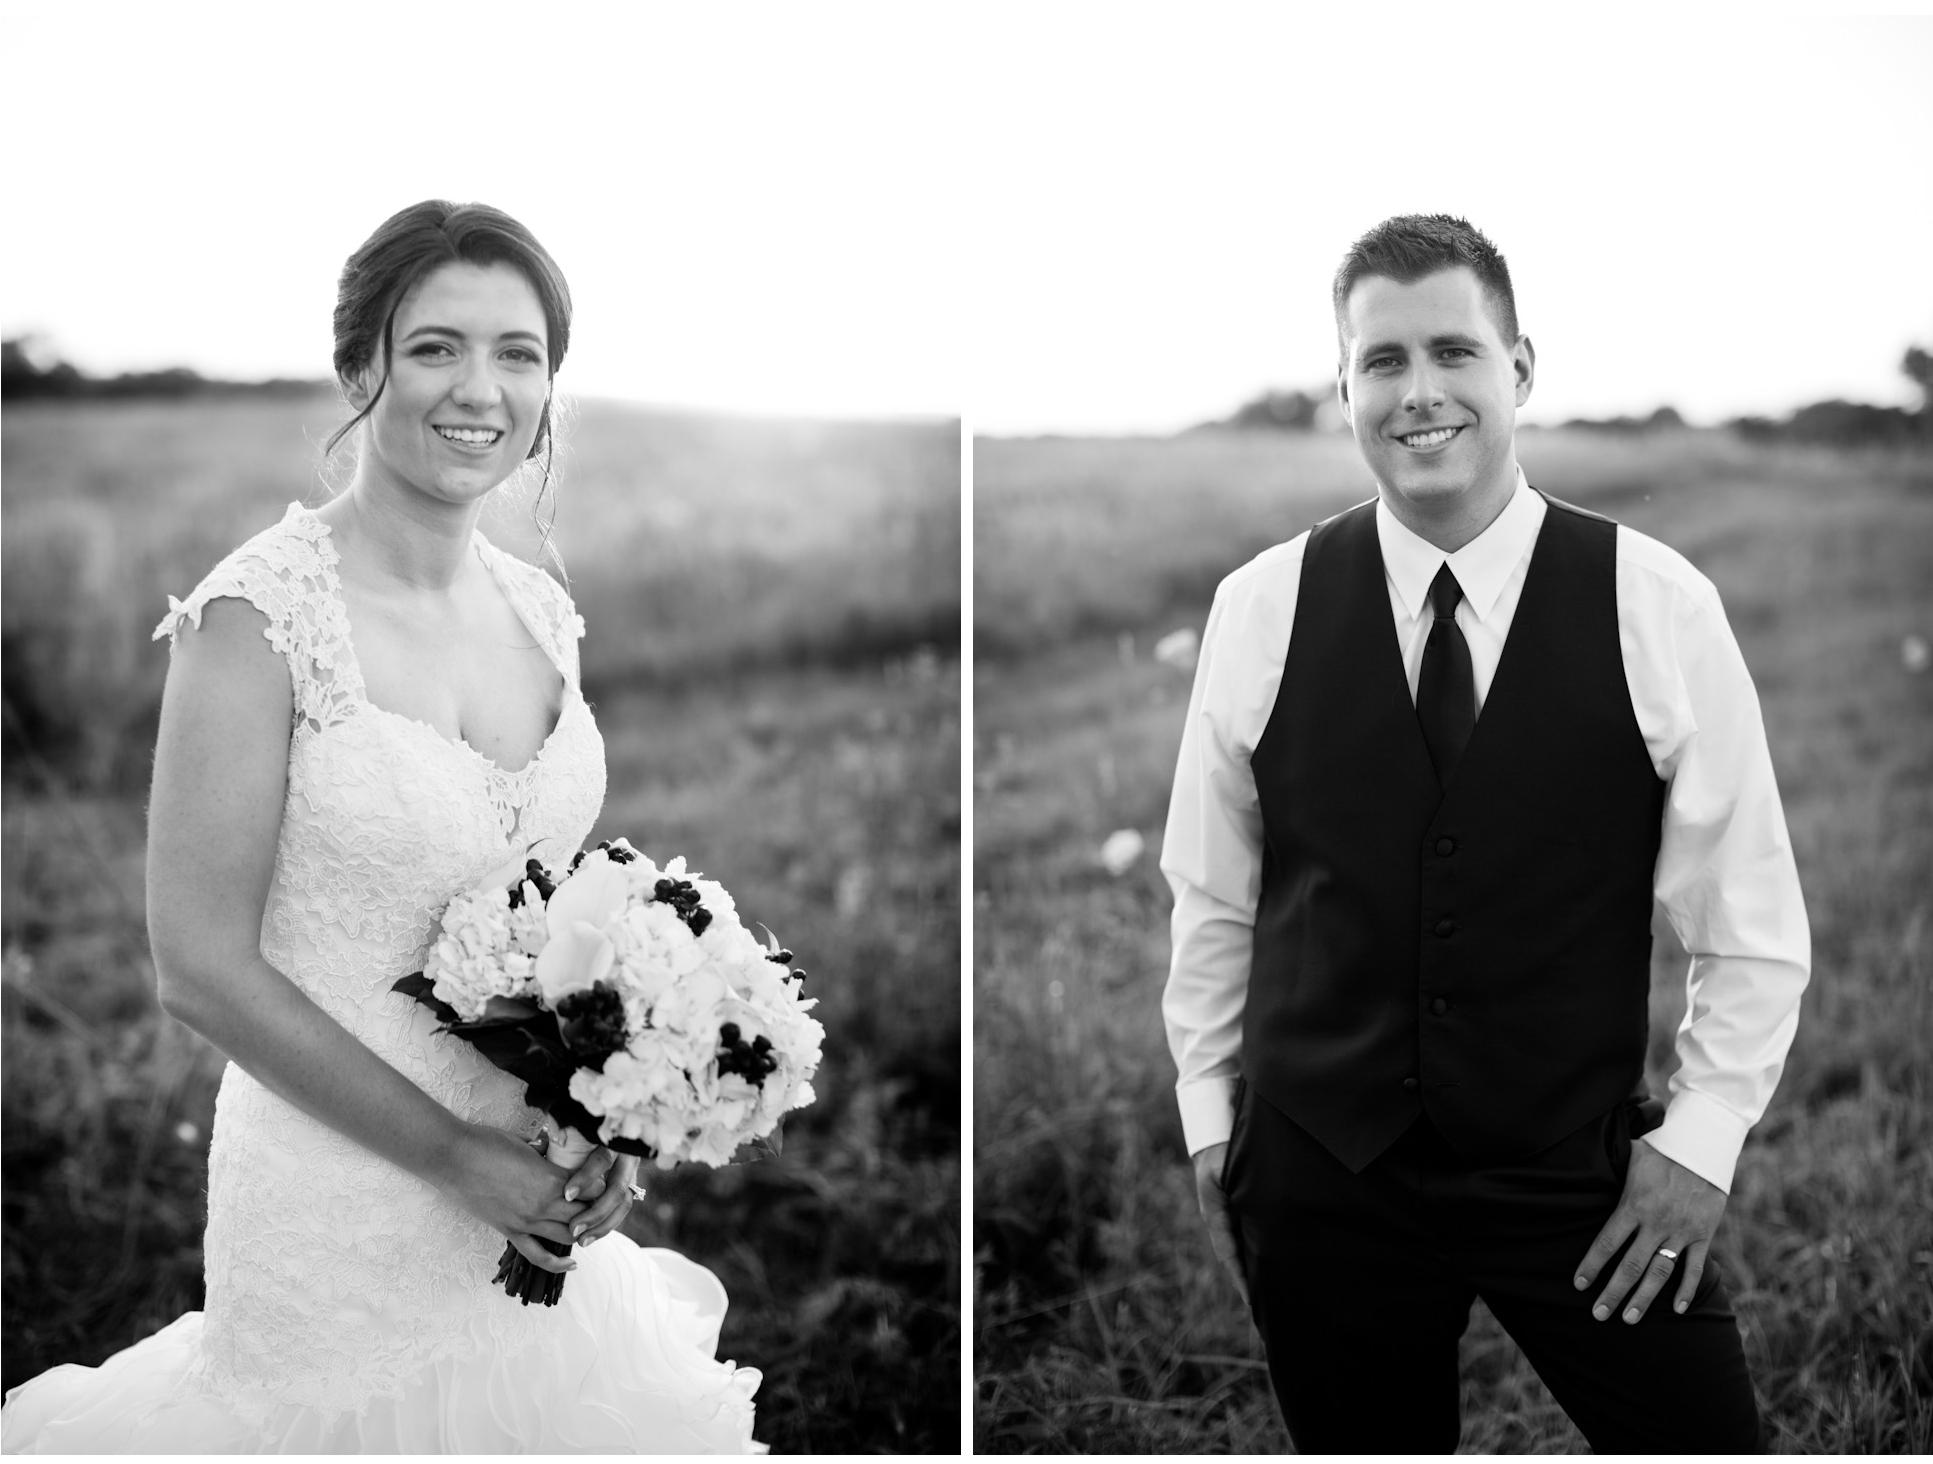 leezer-wedding-des-moines-sunset-ridge-barn02.jpg